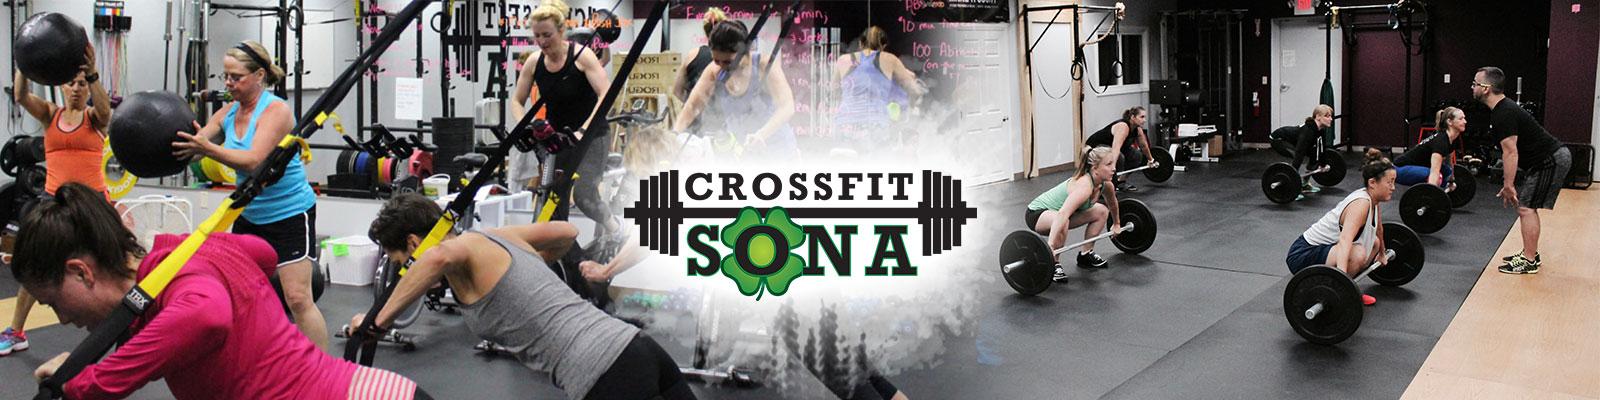 CrossFit Sona BiziFit Binghamton